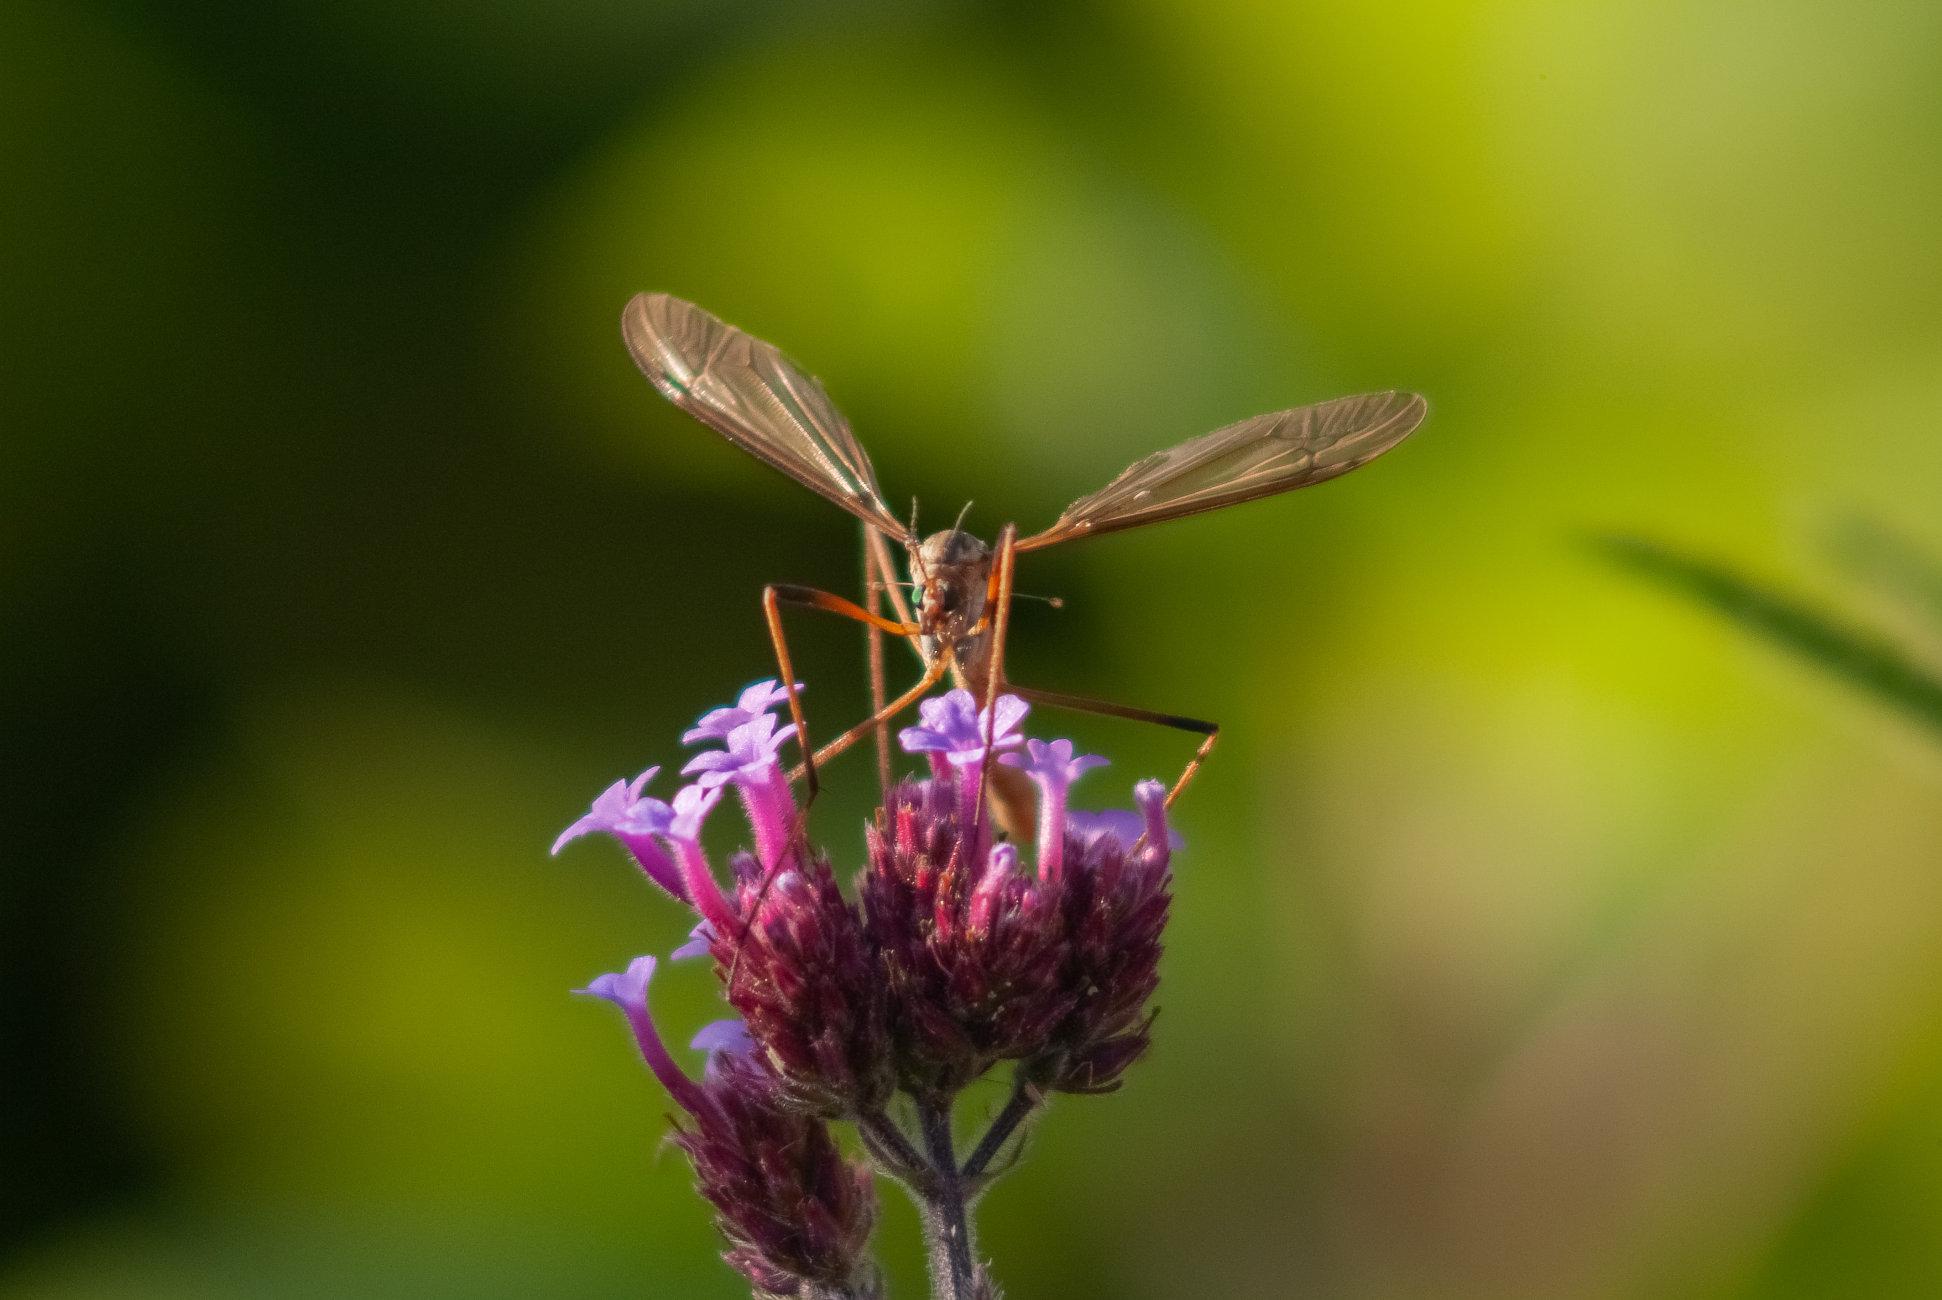 A Cranefly - Daddy Long Legs